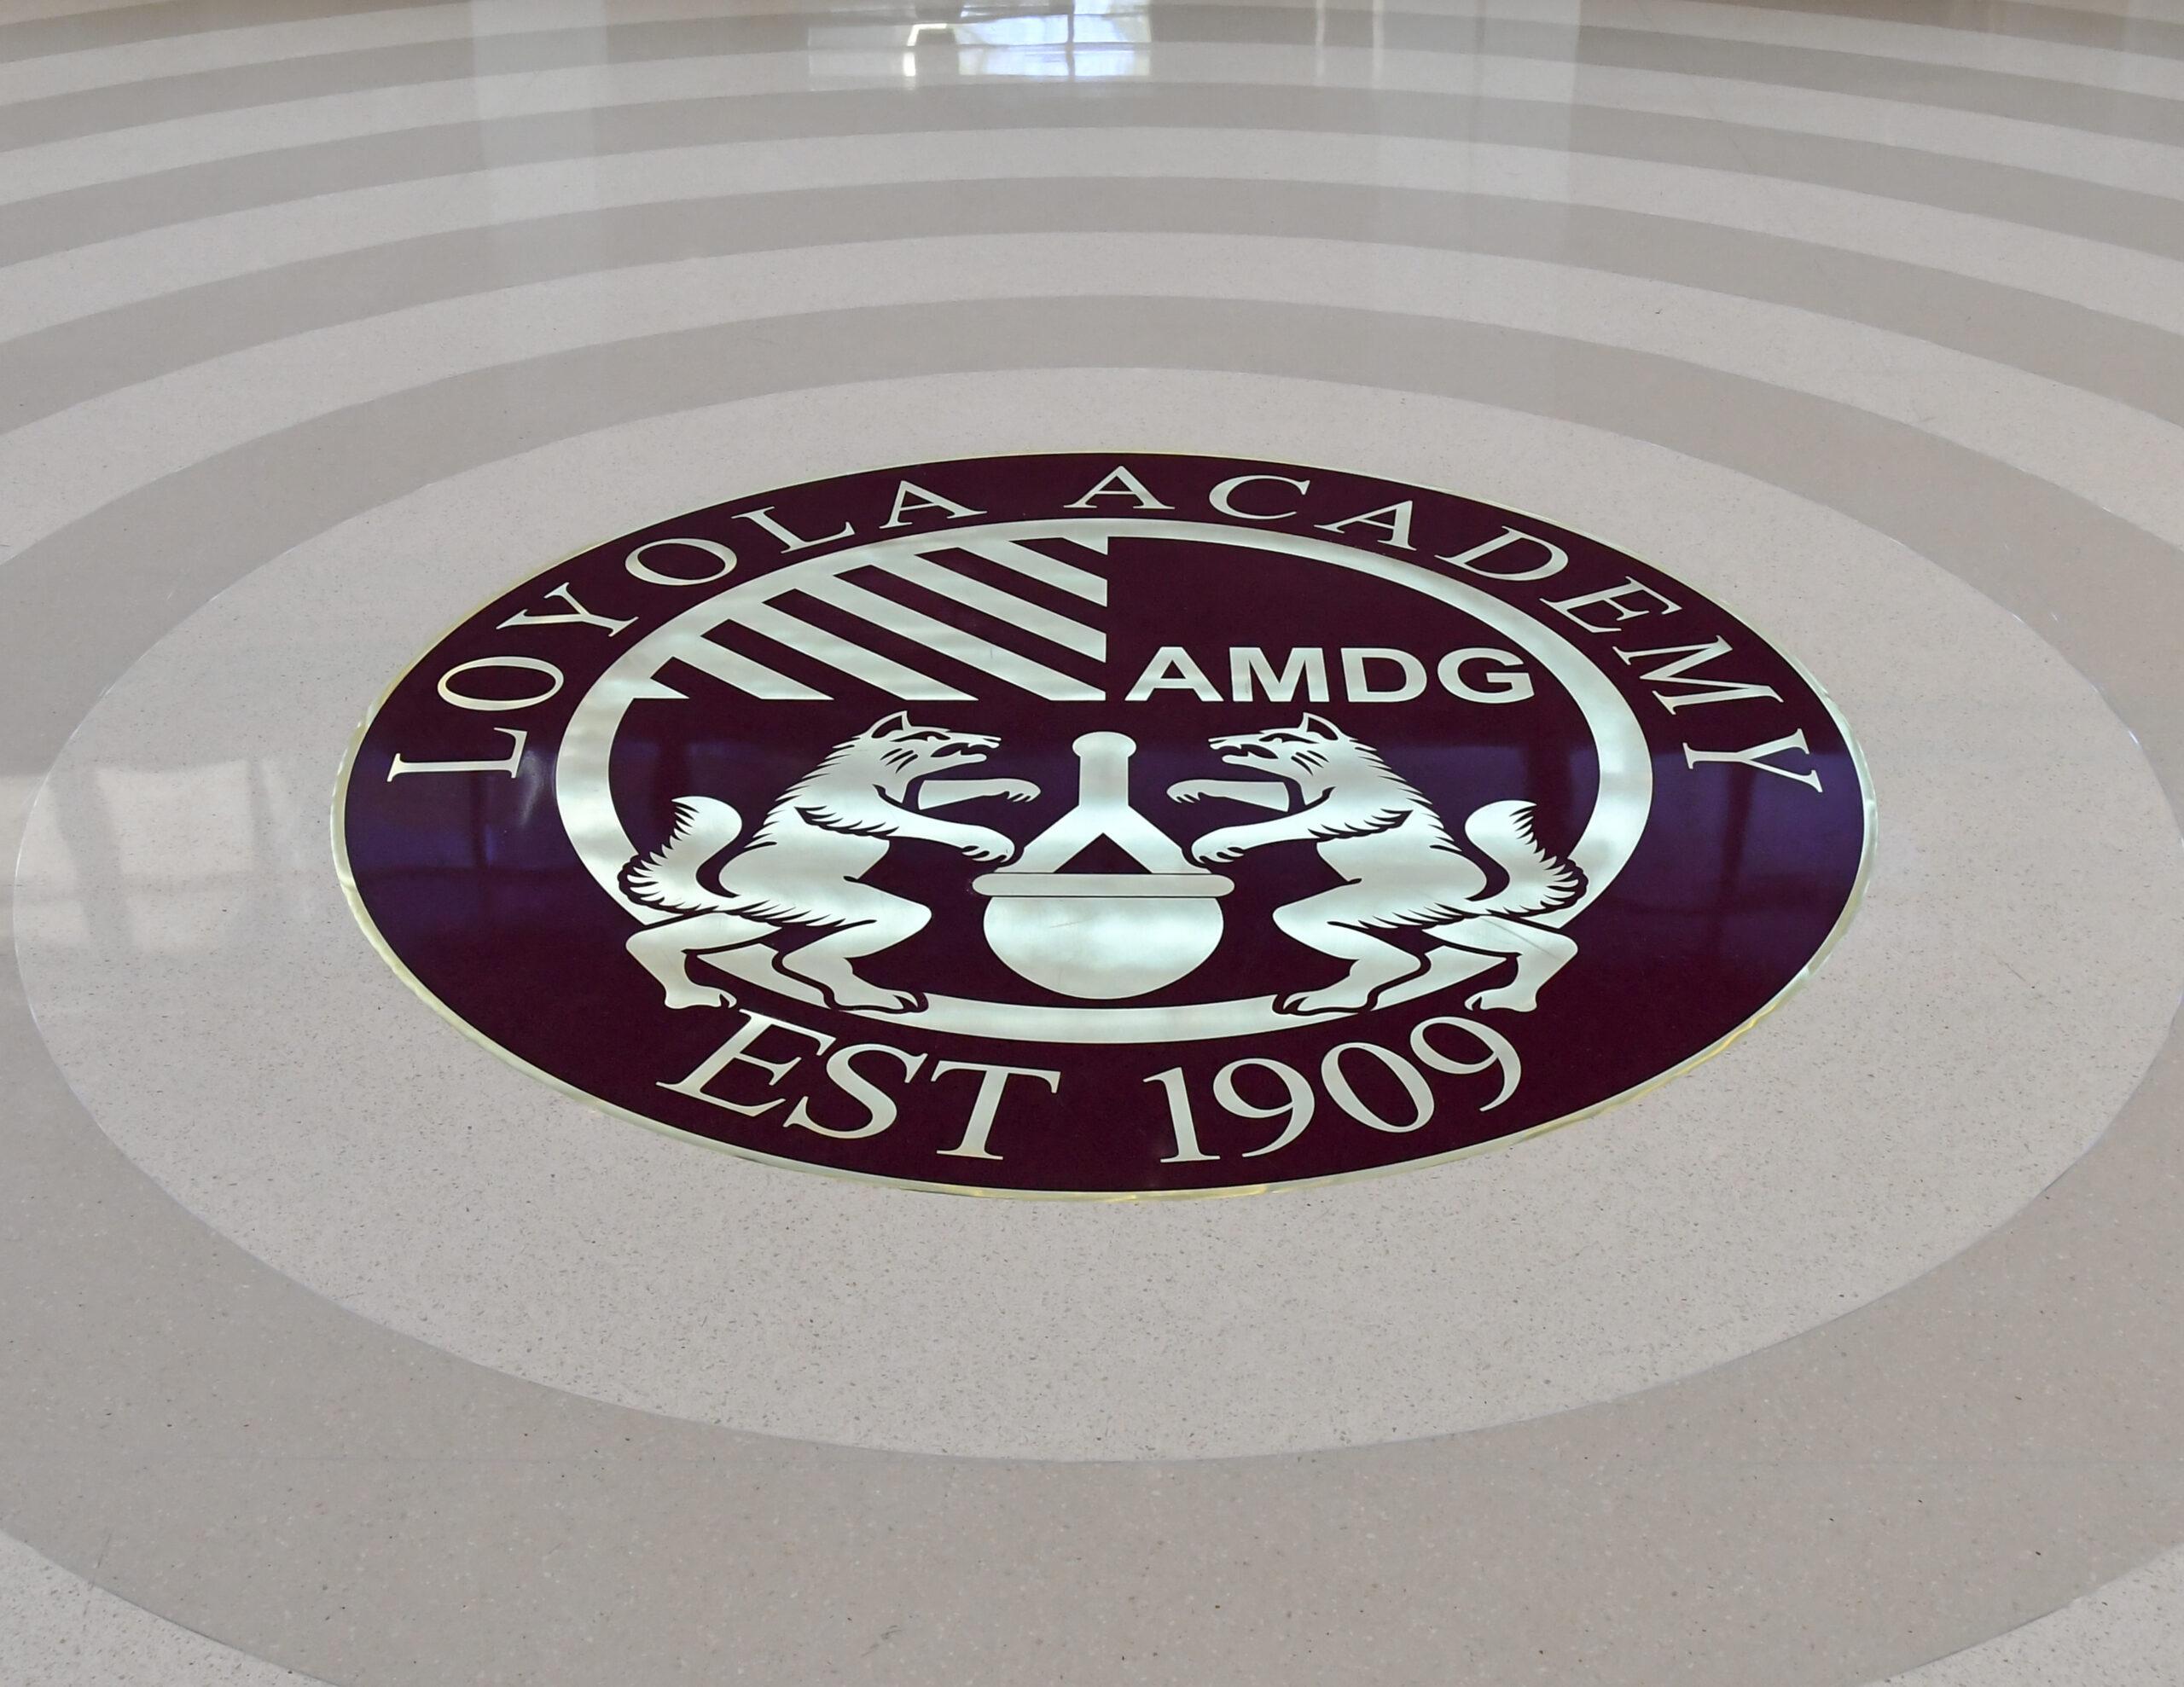 Signage and school emblem on floor, Loyola Academy Aquatic Center.